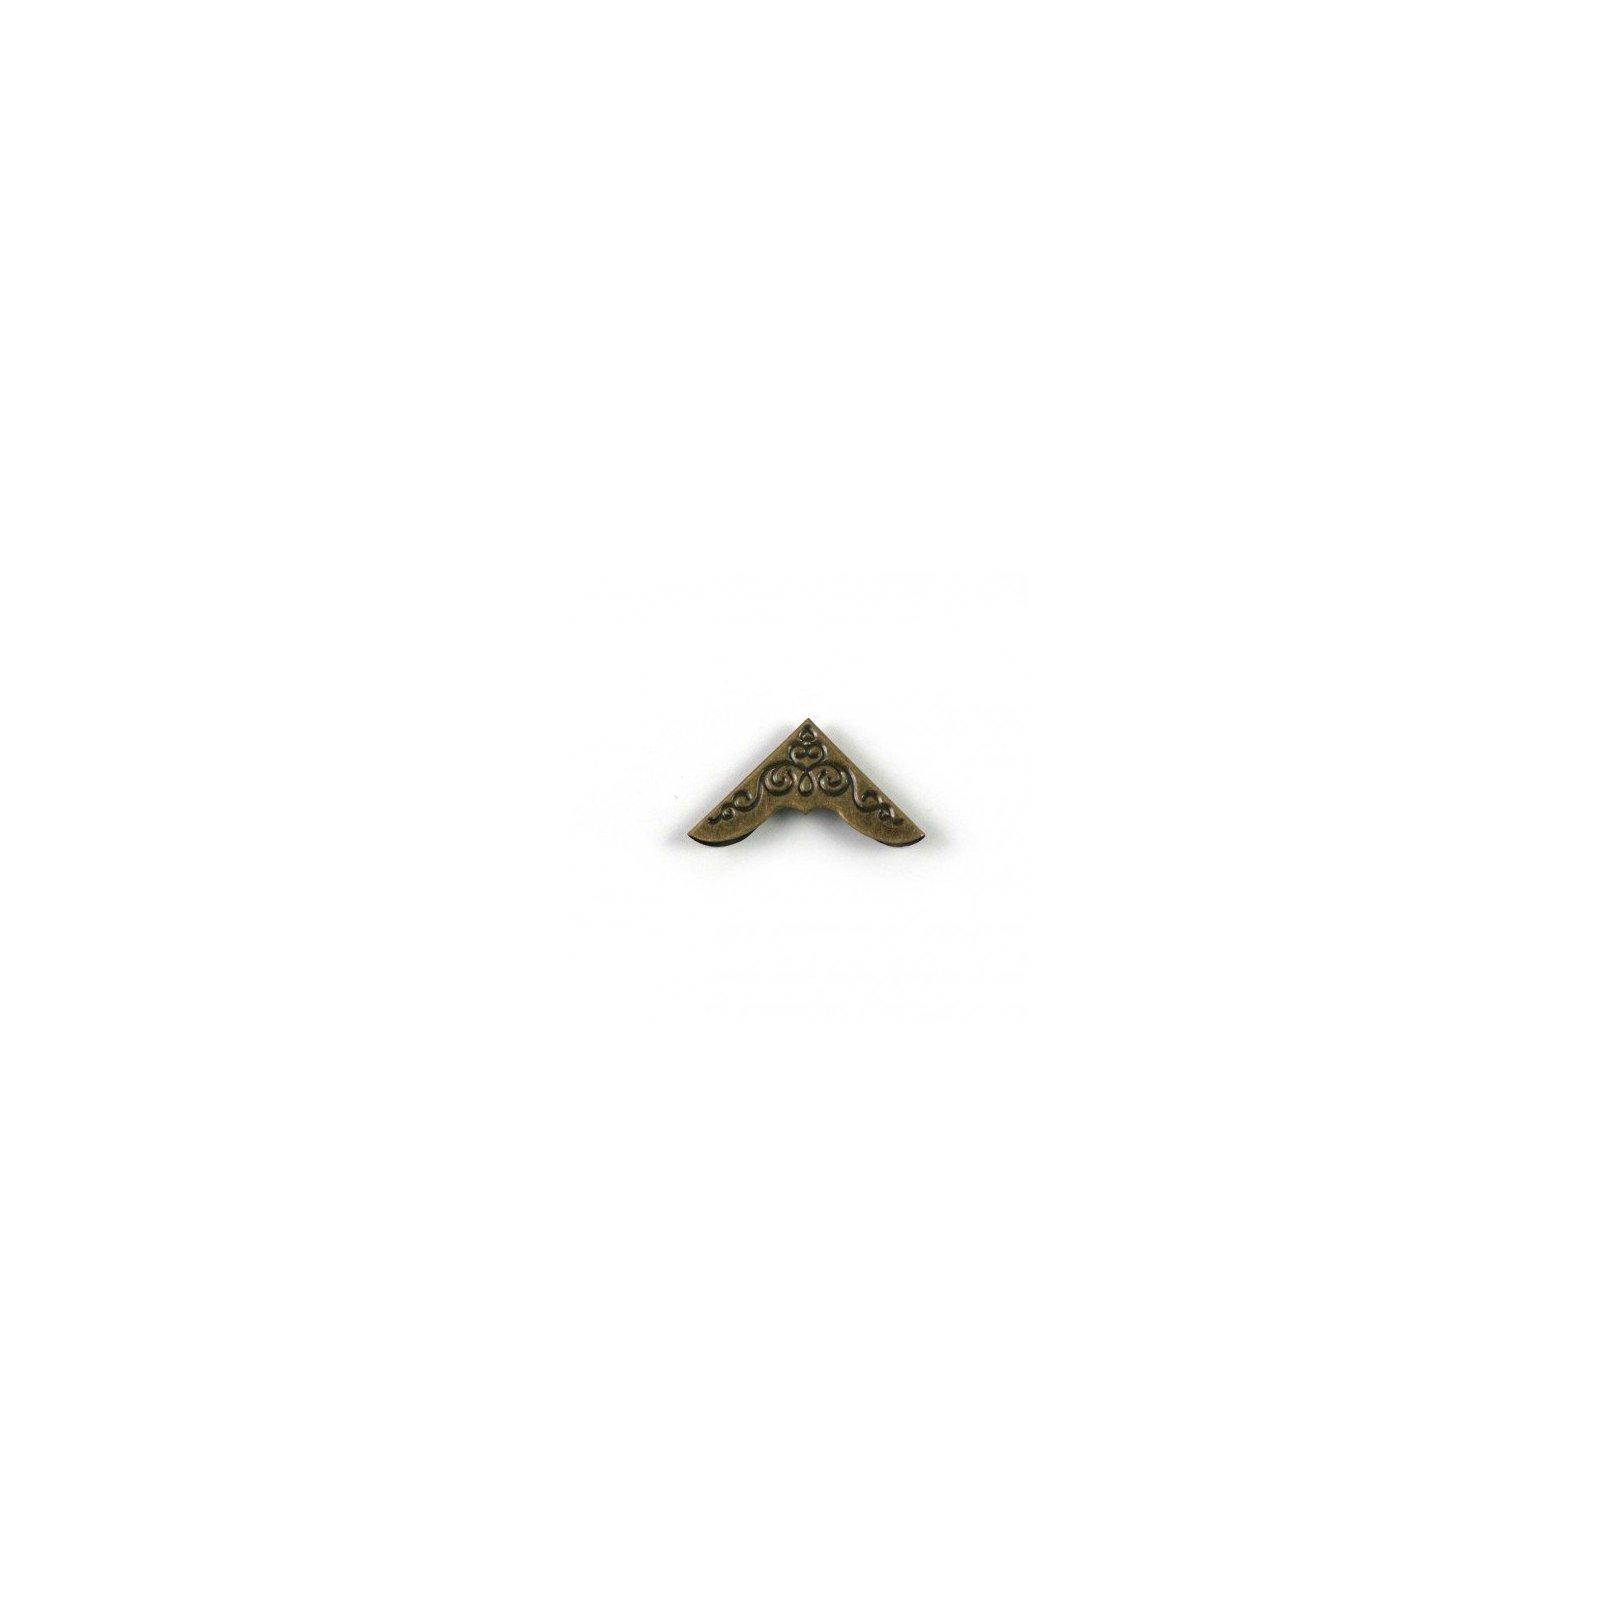 Coin en bronze travaillé - 30x30 mm - Ephemeria